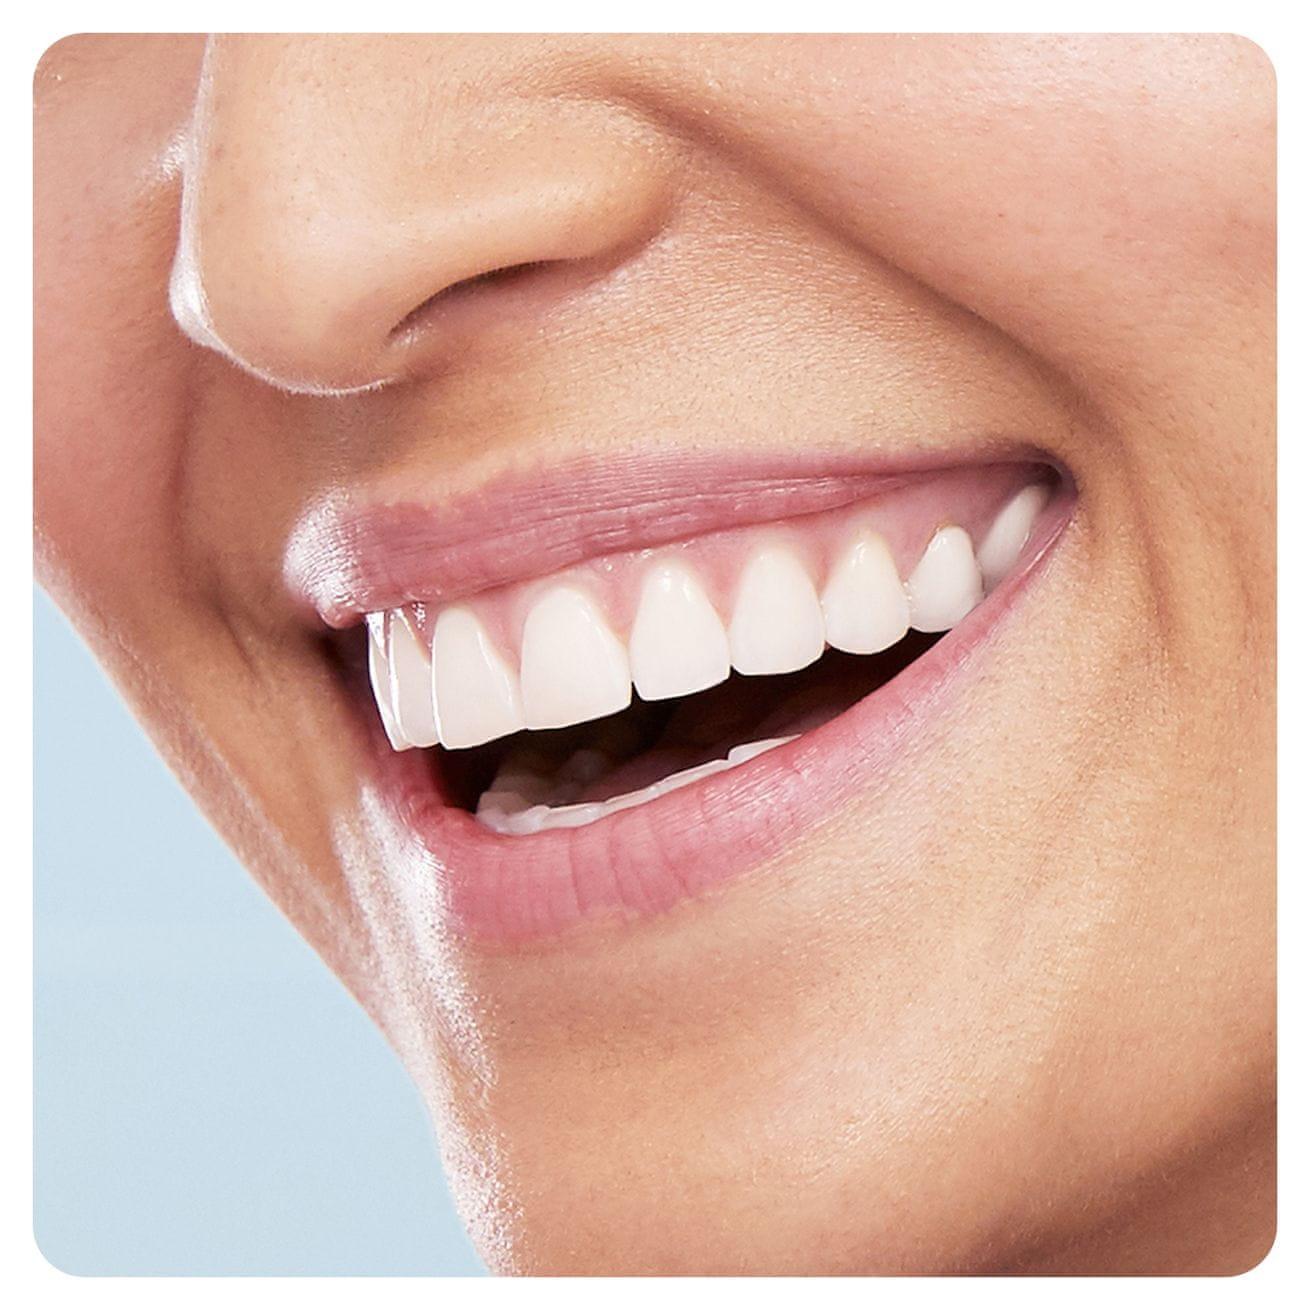 Oral-B Vitality 100 CrossAction black 2D technologie